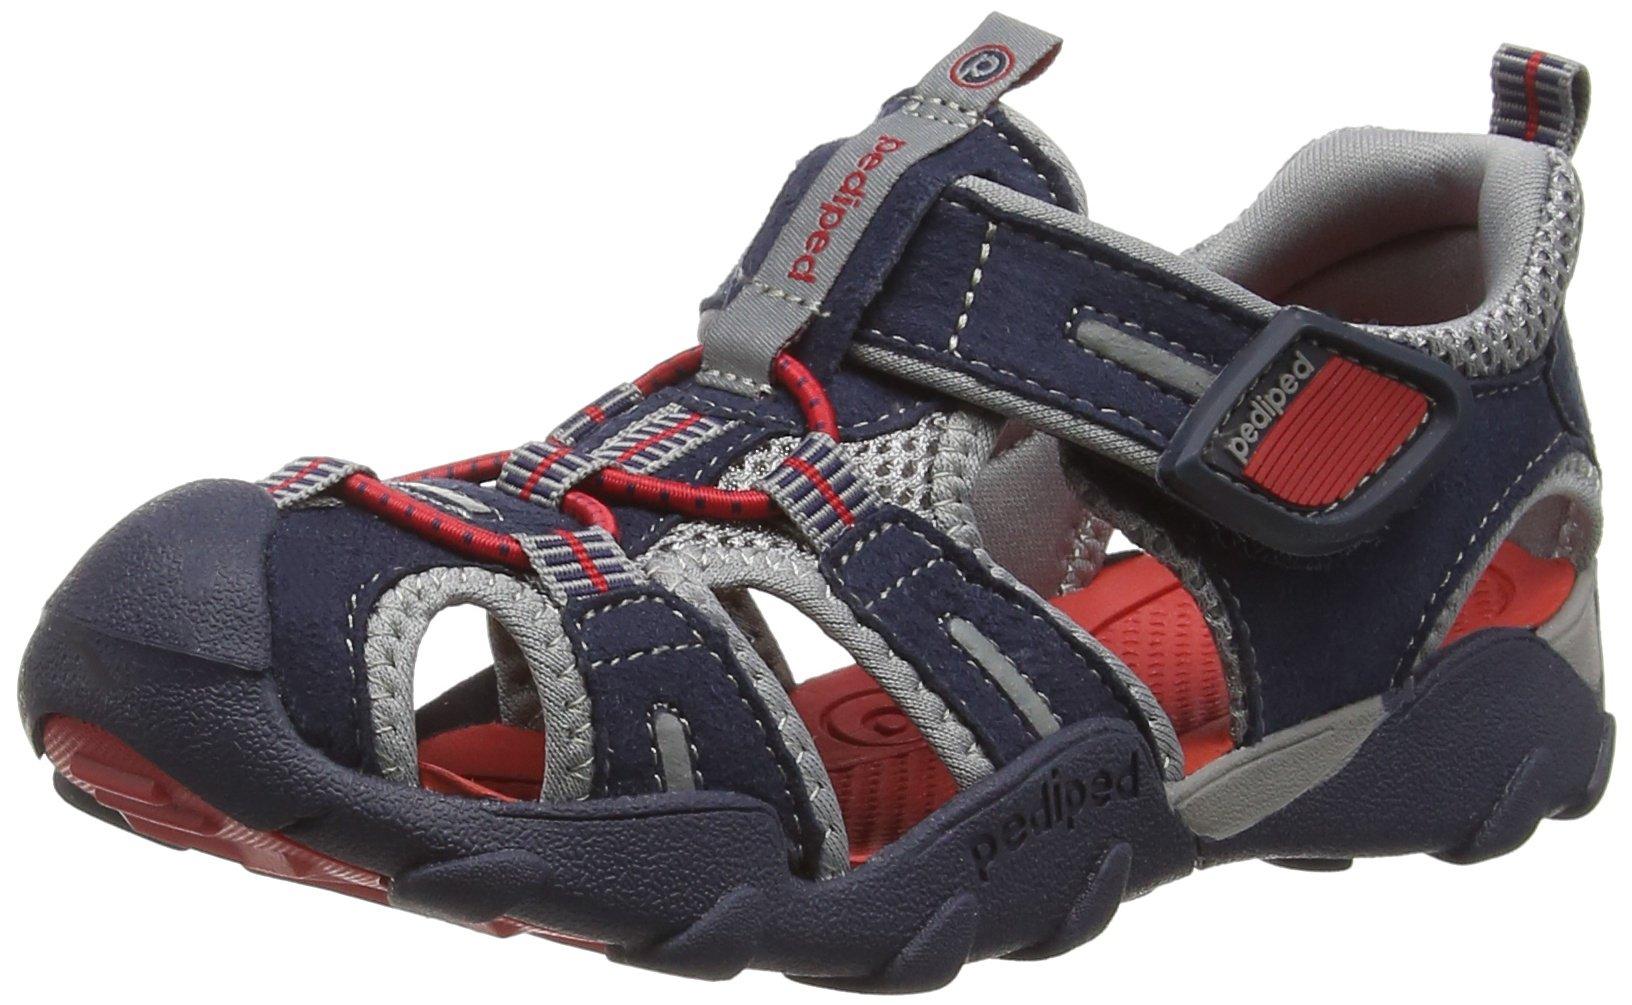 pediped Flex Canyon Water Sandal (Toddler/Little Kid/Big Kid), Navy/Red, 24 EU(7.5-8 E US Toddler)